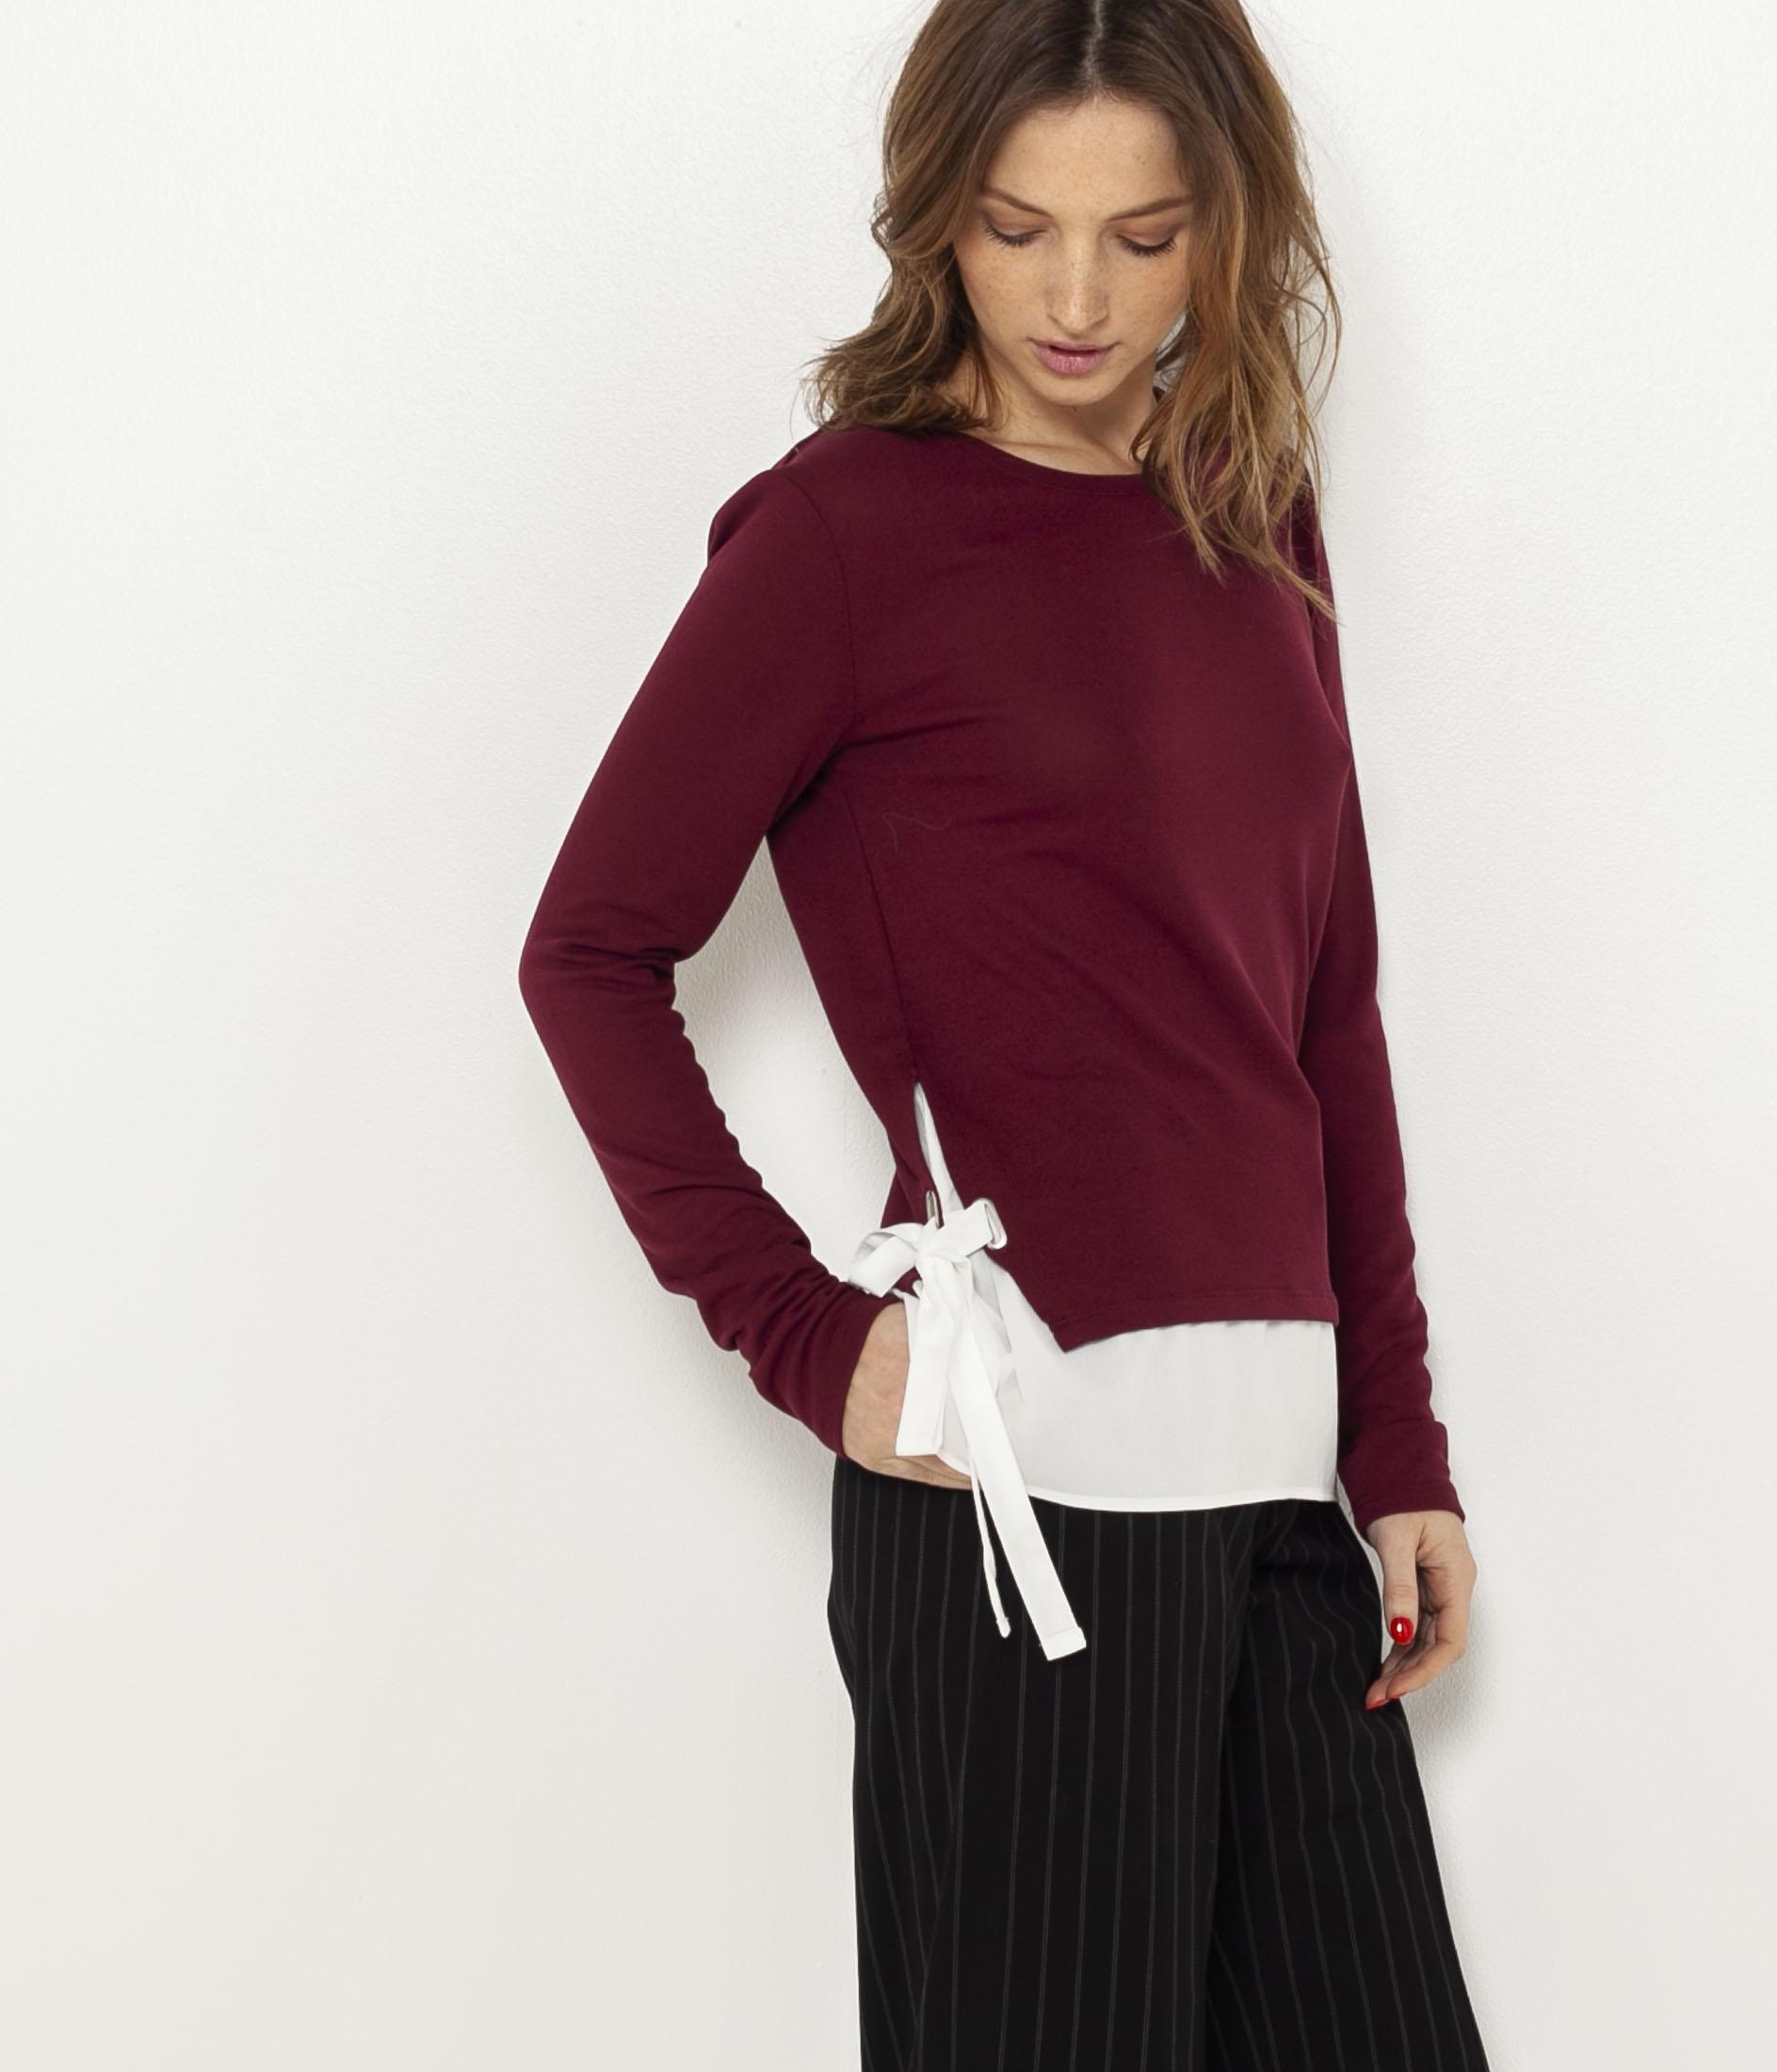 Camaïeu Bi Femme shirt Matière T Noeuds l1cTFKJ3